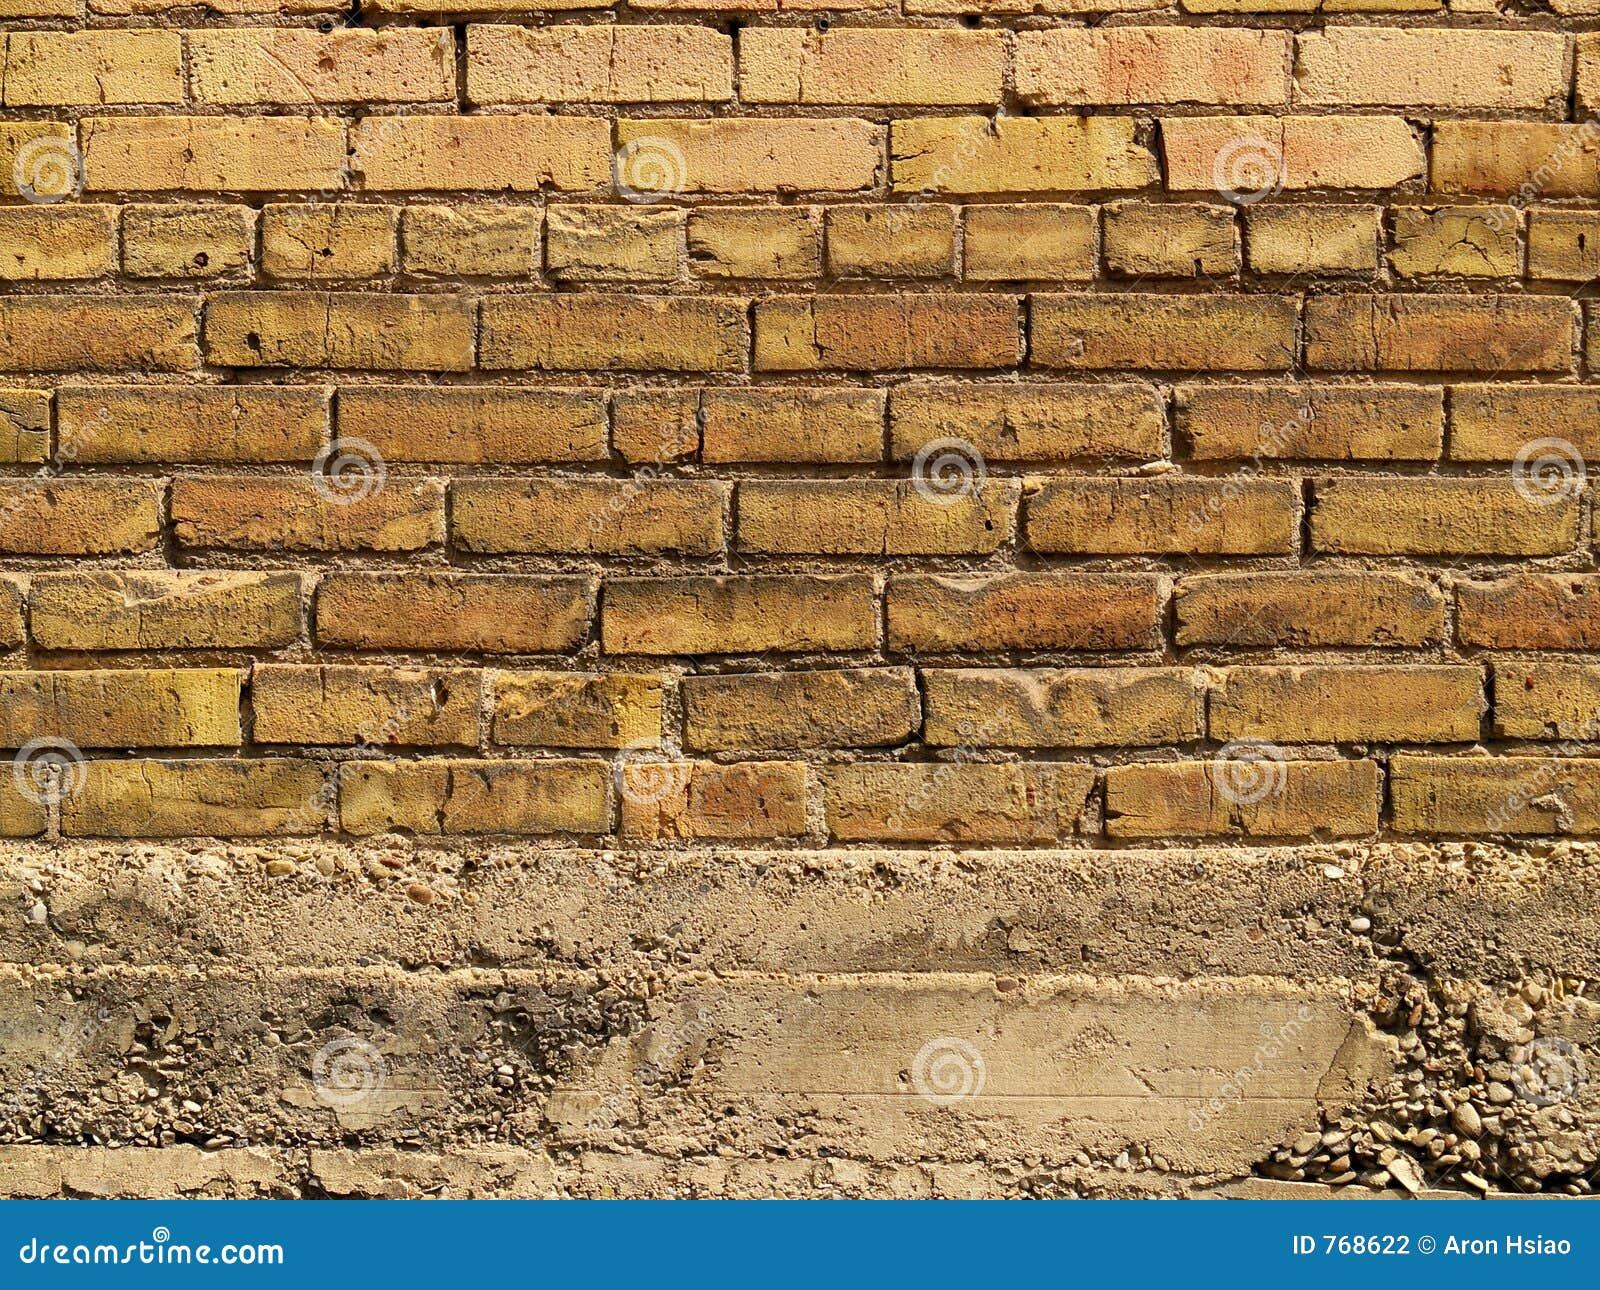 Orange and yellow brick wall over concrete